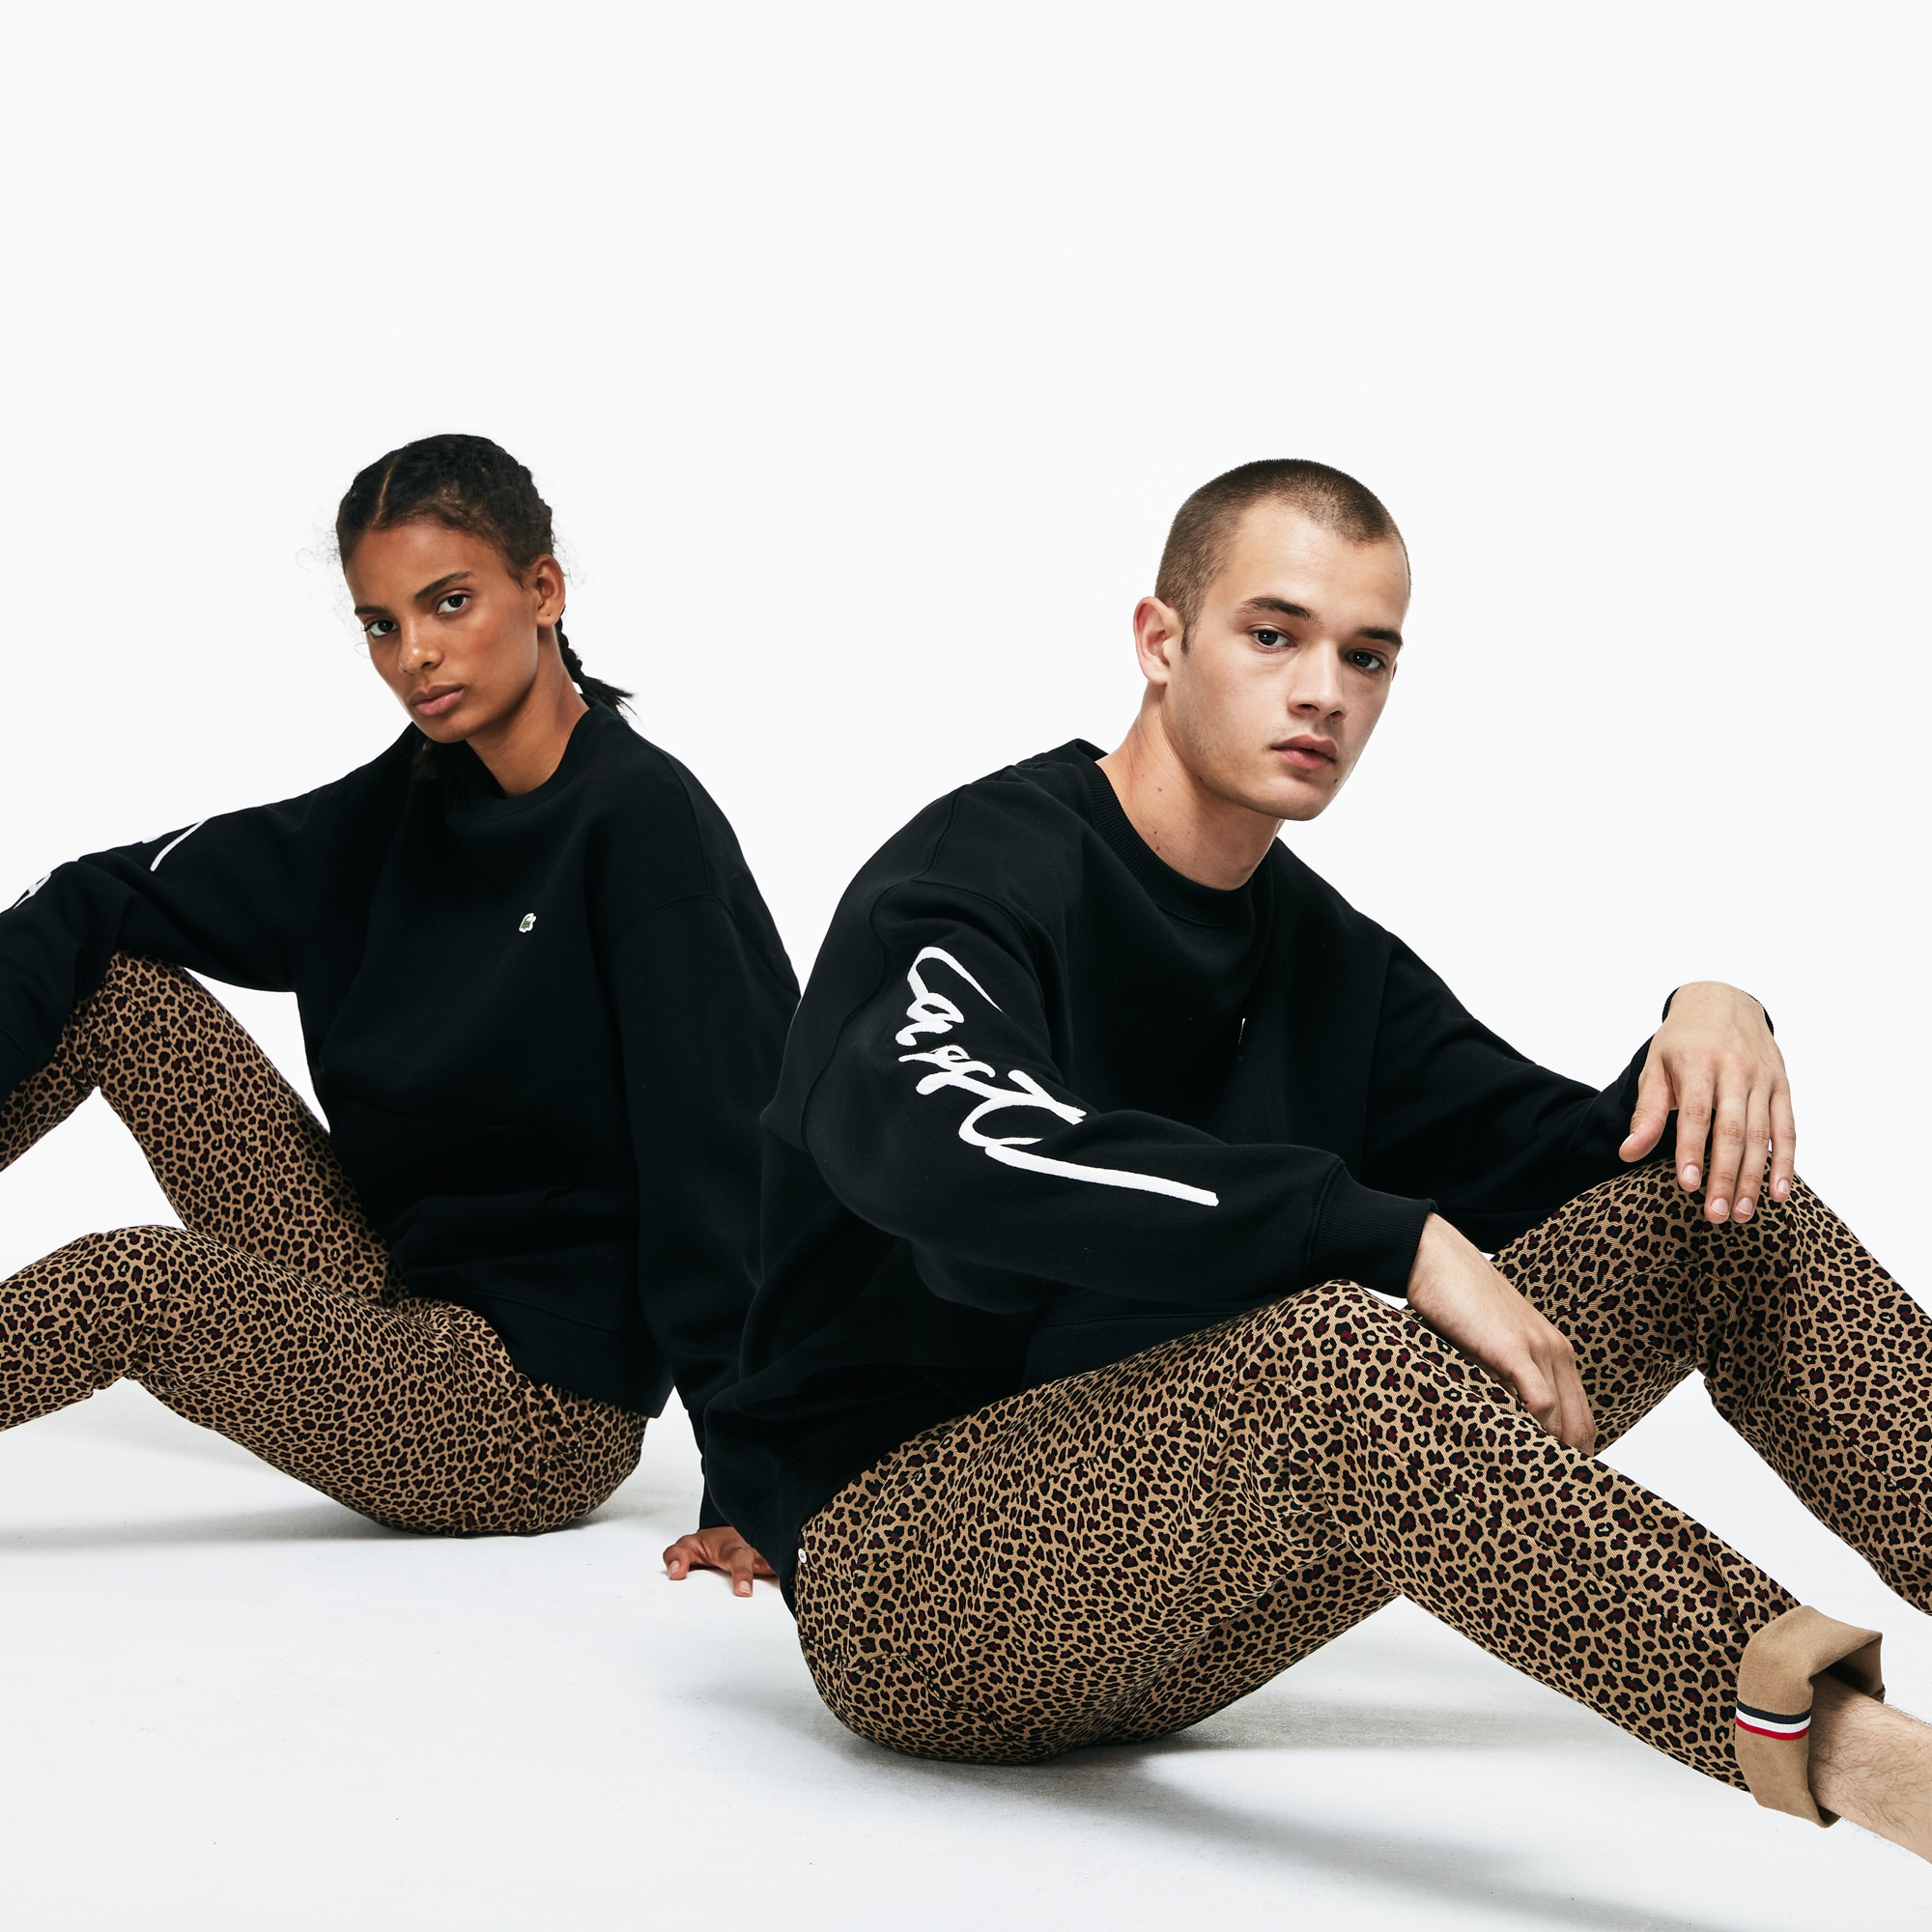 Unisex Lacoste LIVE Crew Neck Embroidered Fleece Sweatshirt